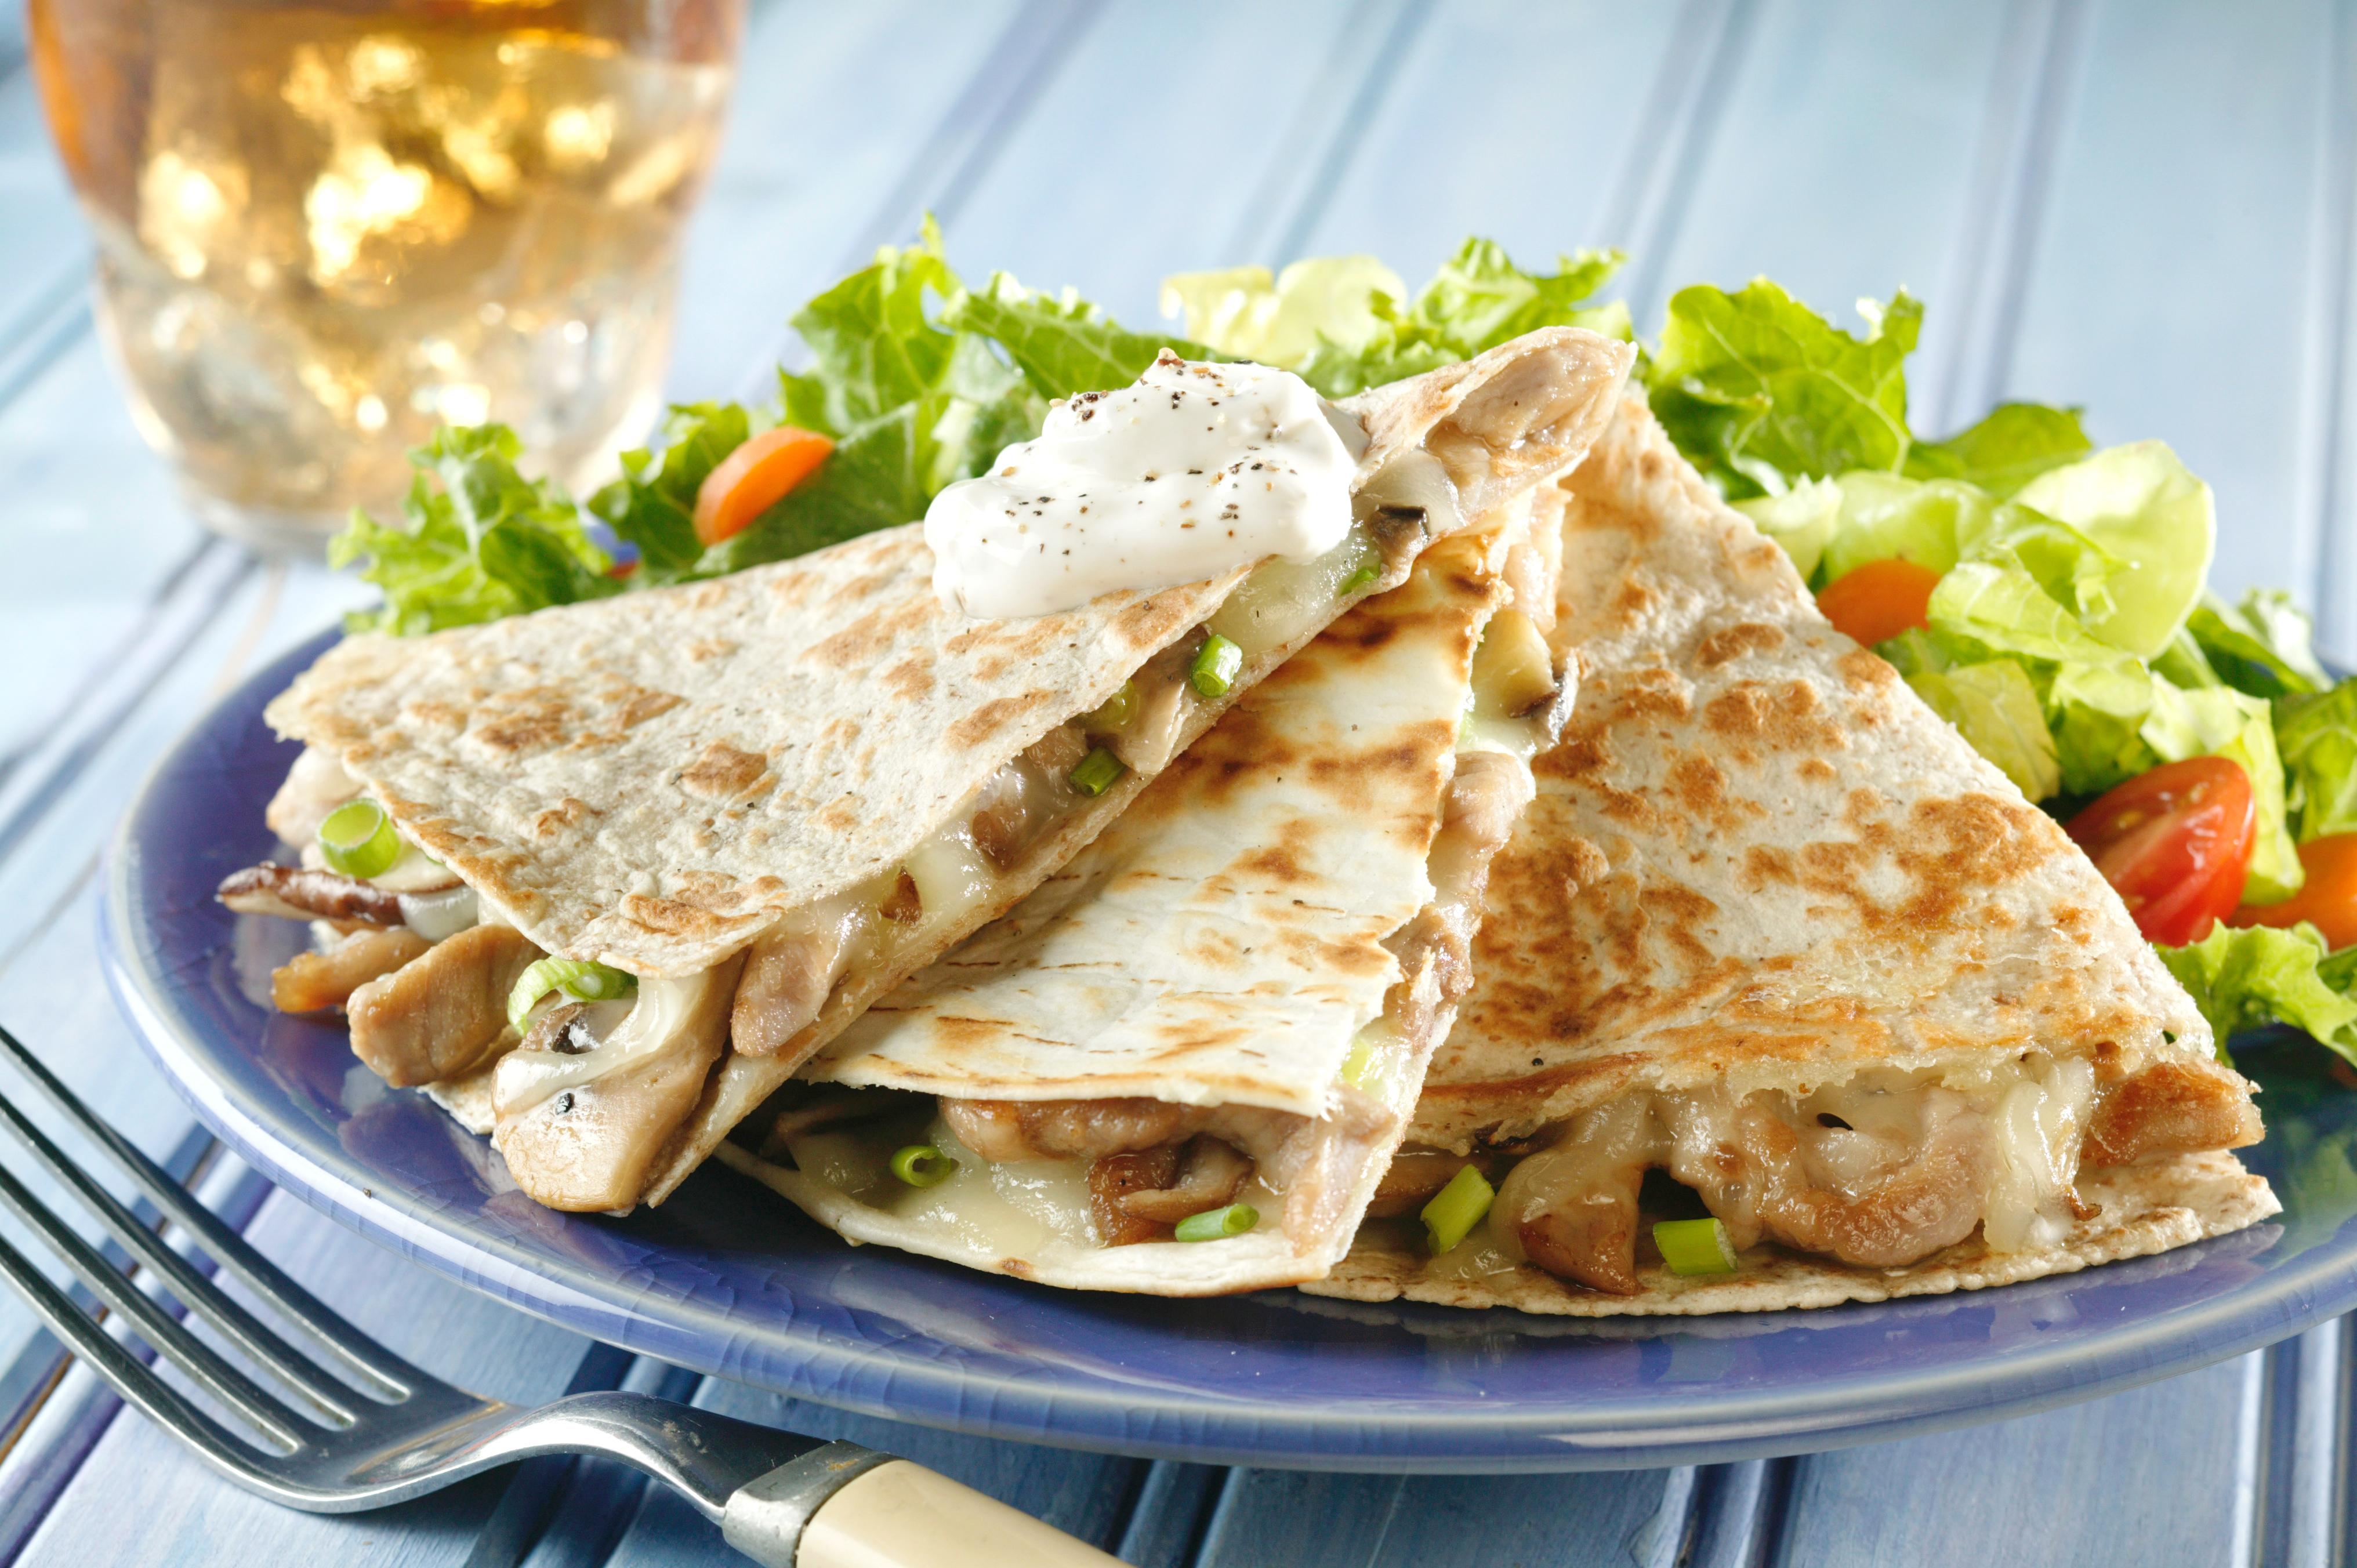 Pork And Mushroom Quesadillas - Pork Recipes - Pork Be Inspired